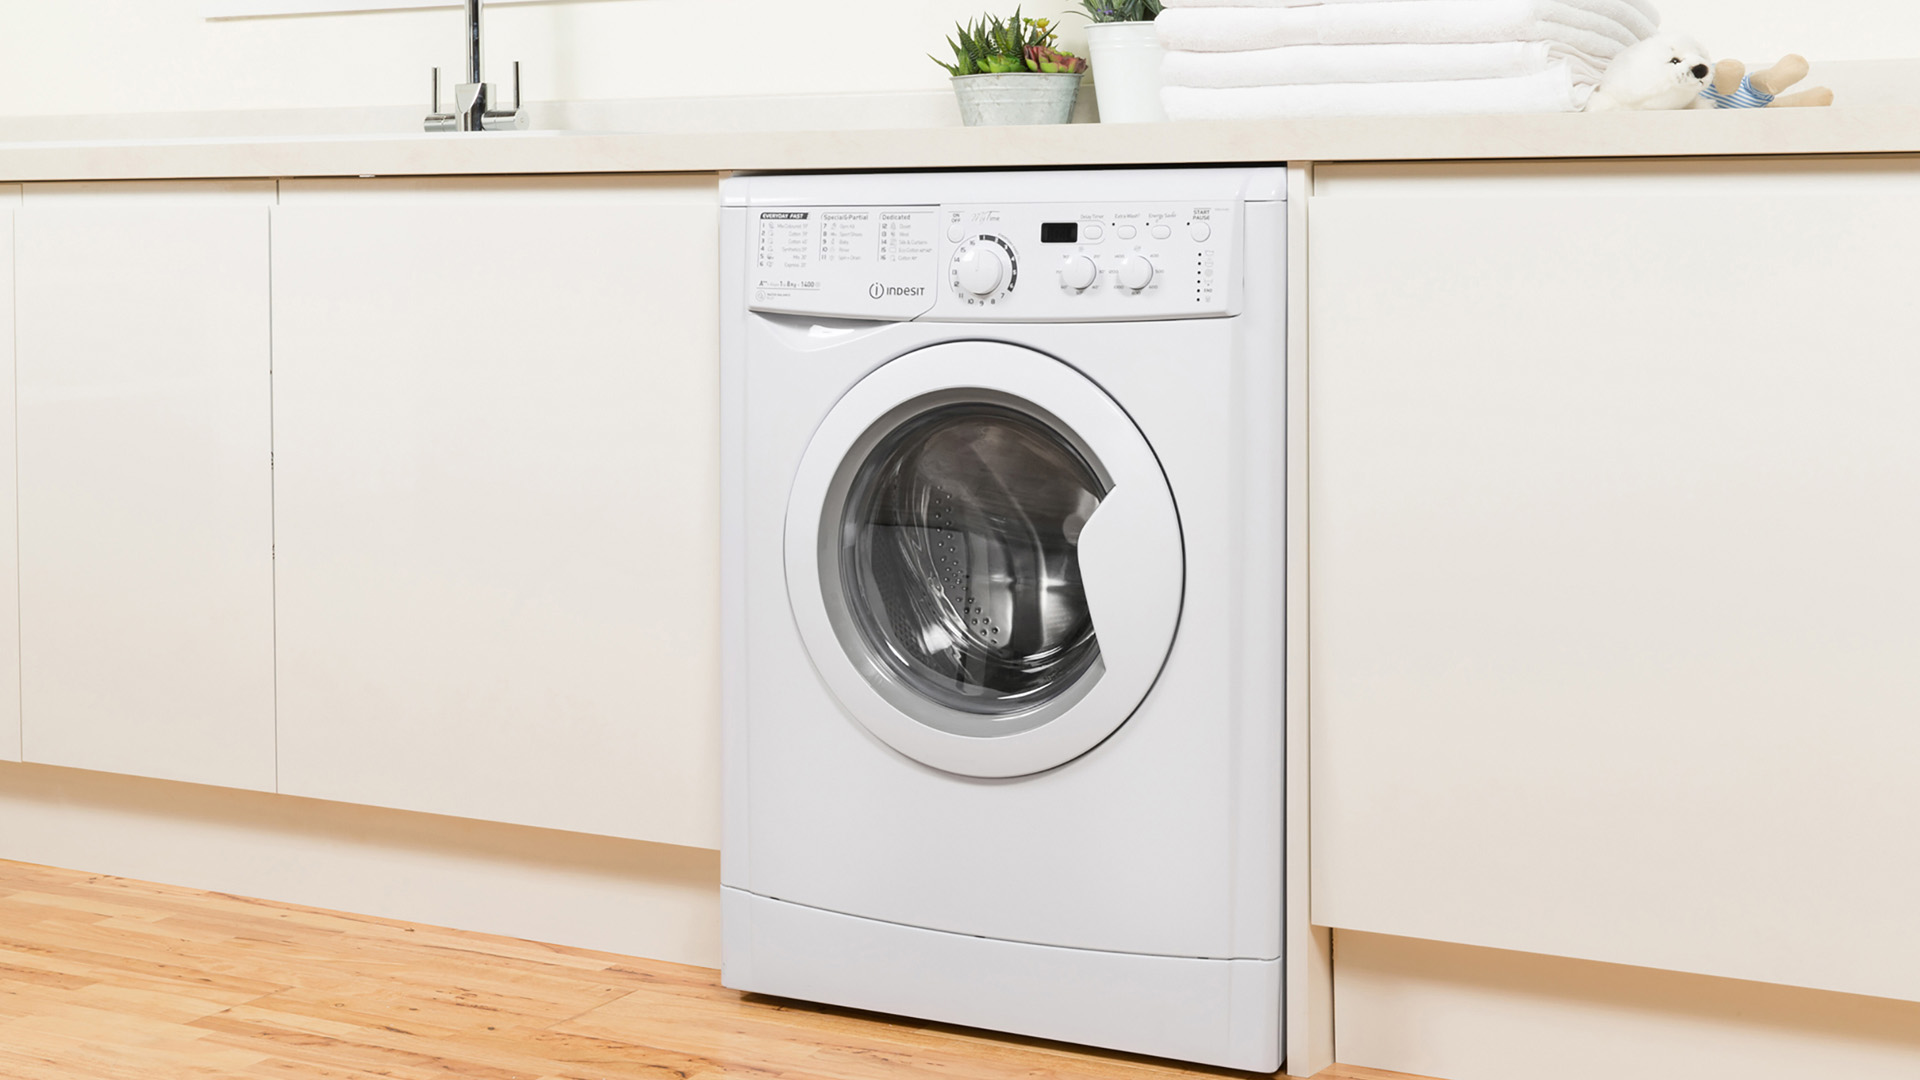 105cffd4899 Σύνδεση Πλυντηρίου & Εγκατάσταση – Κουρούτσαλης Πασχάλης